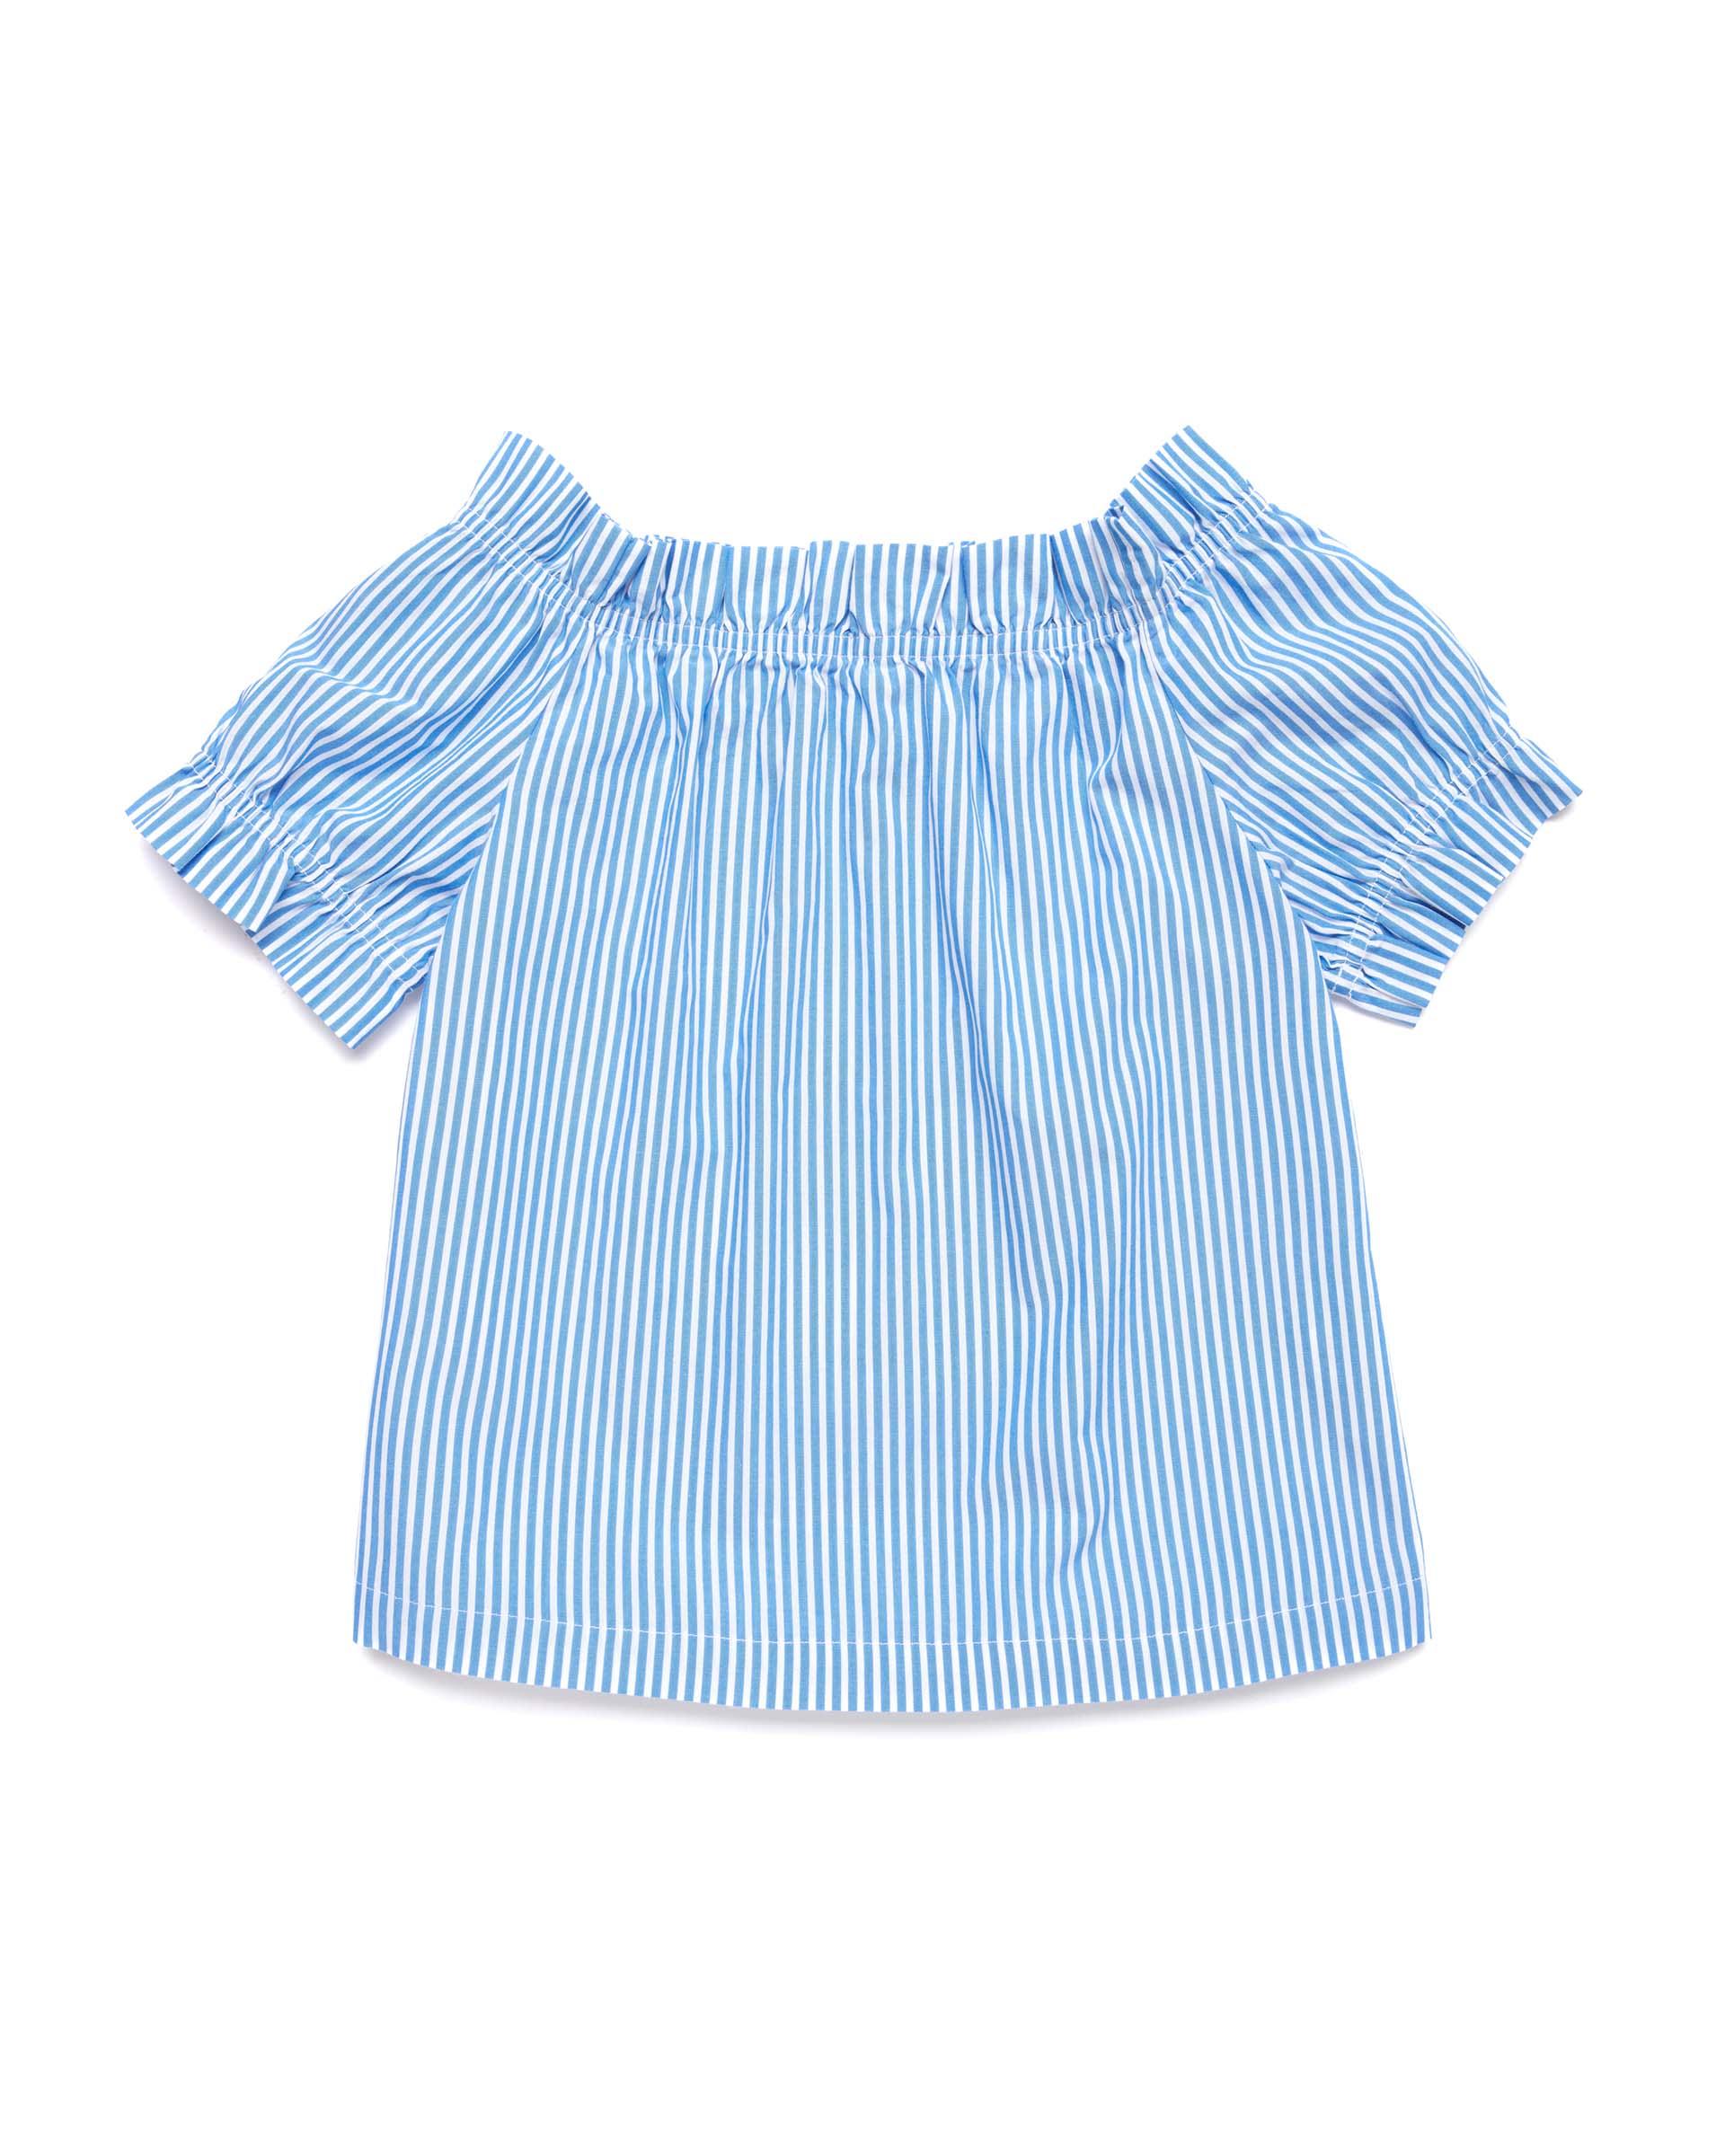 20P_5OT65QH40_901, Блуза для девочек Benetton 5OT65QH40_901 р-р 140, United Colors of Benetton, Блузки для девочек  - купить со скидкой